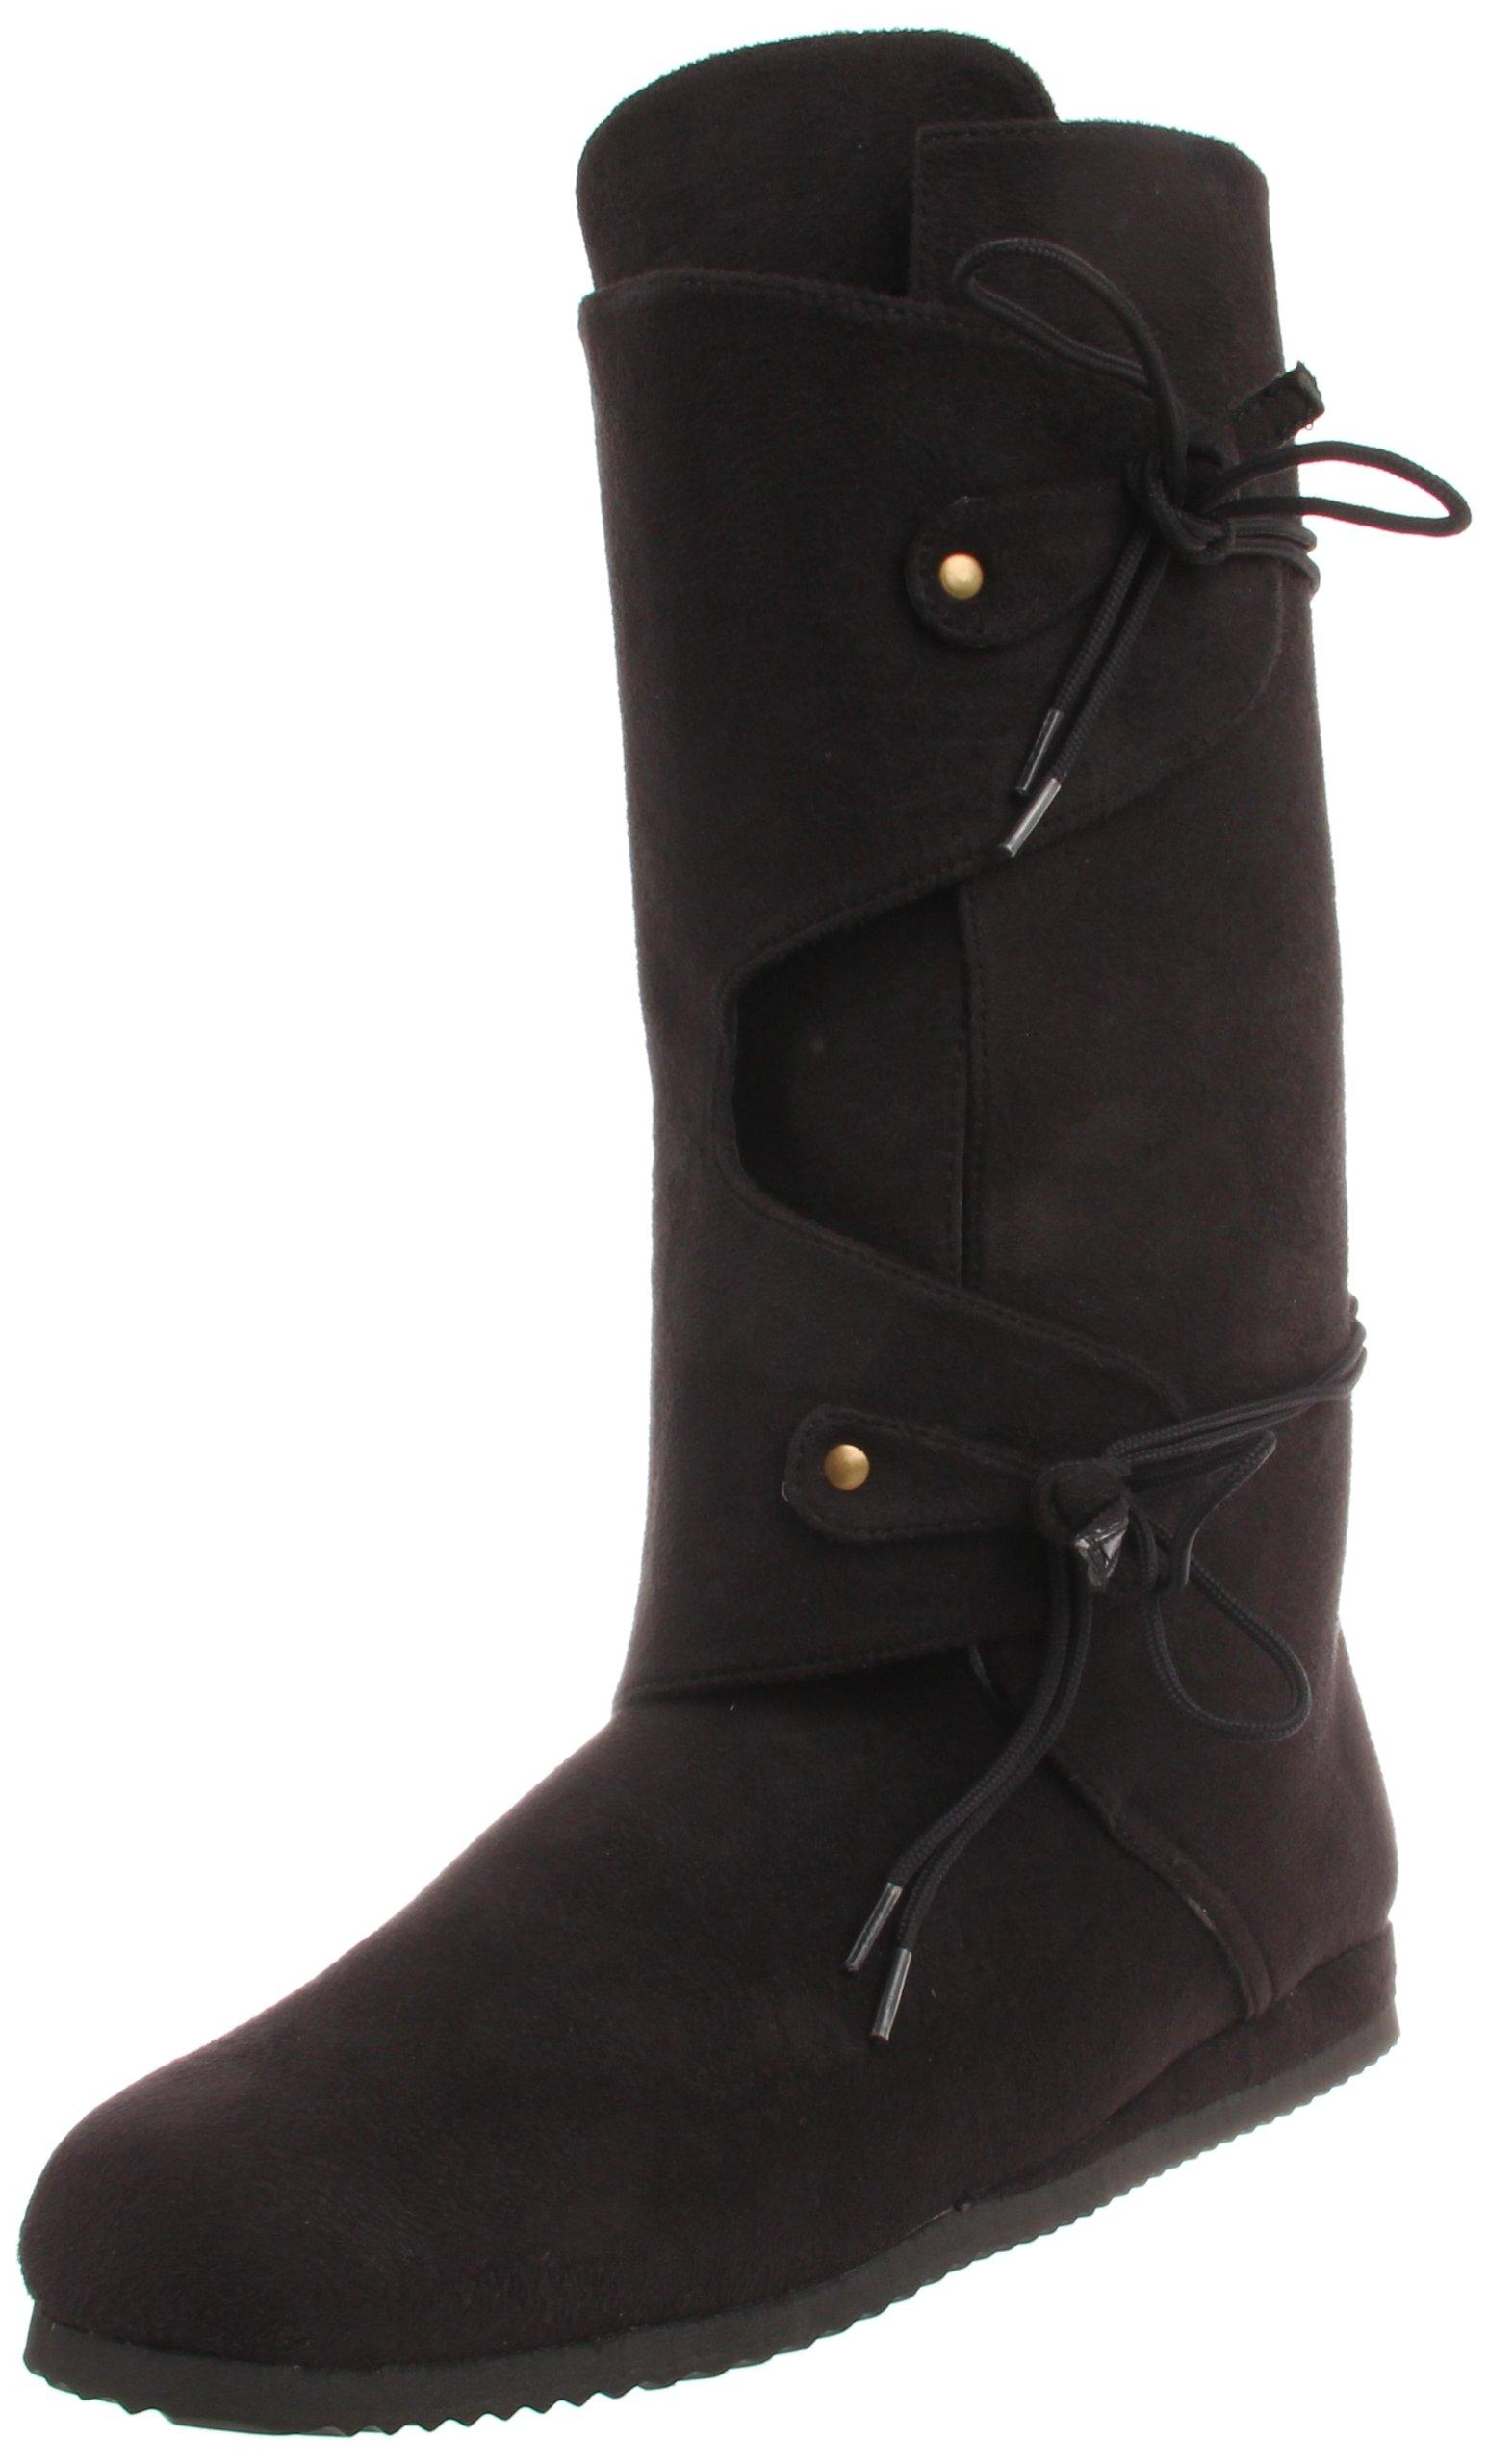 Funtasma Men's Renaissance-100 Boot Black 8-9 D(M) Us 14